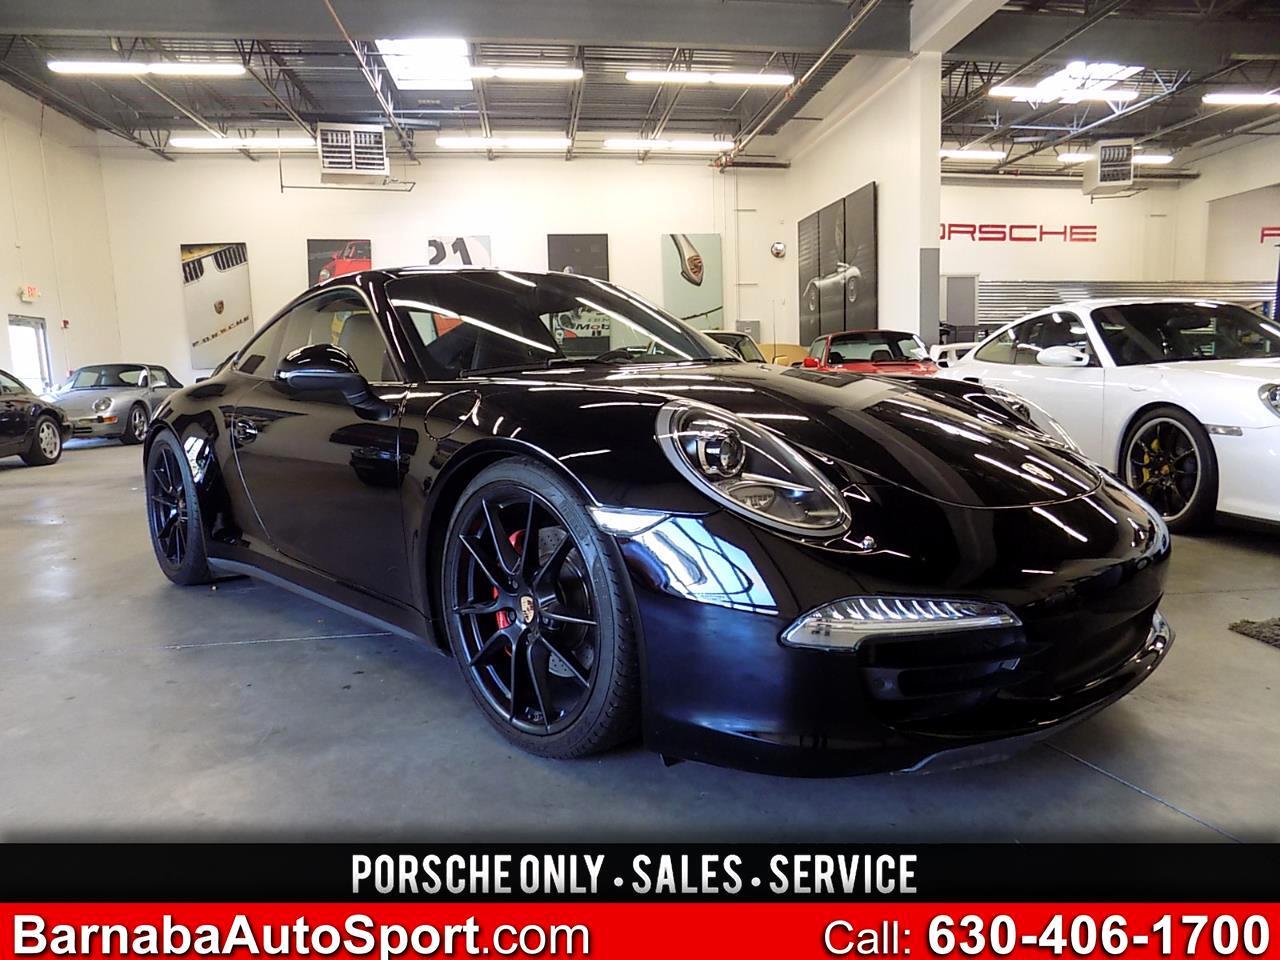 Porsche 911 Carrera 4S Coupe 2013